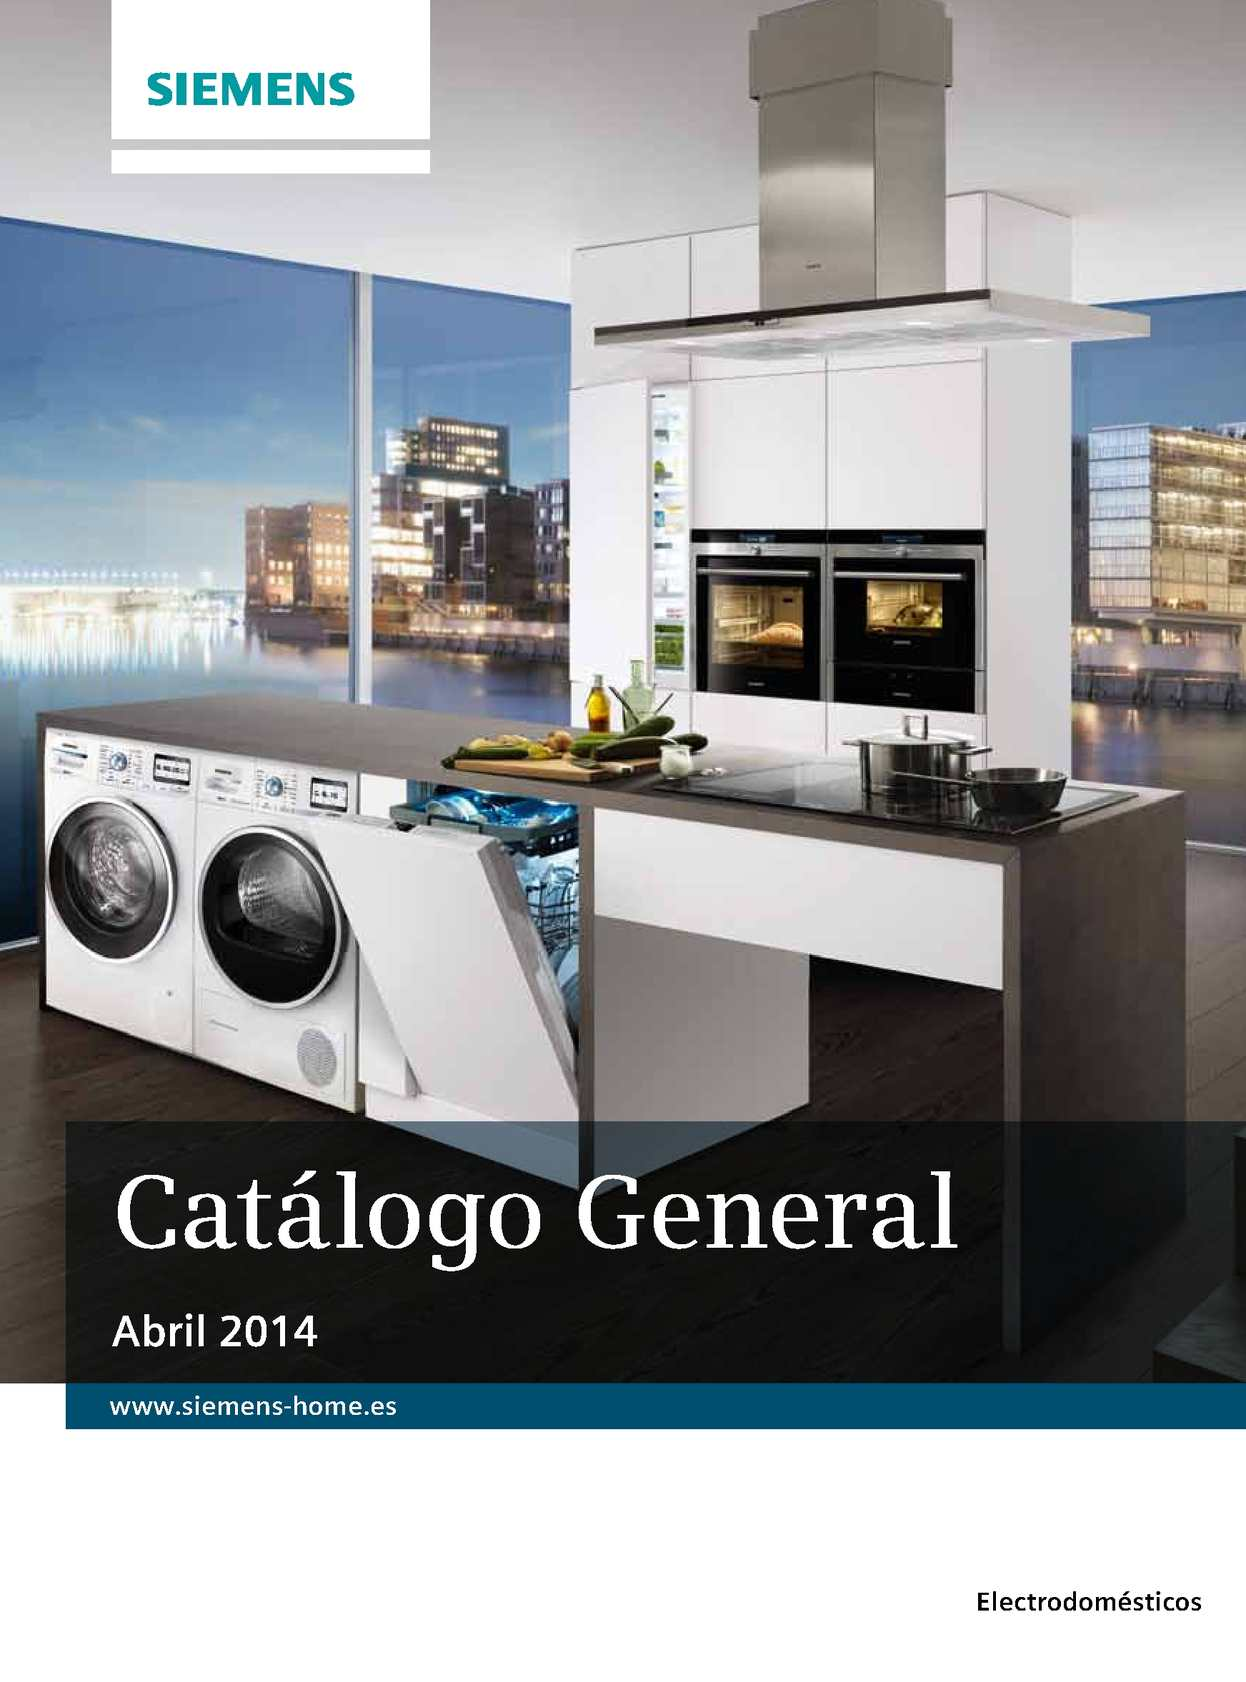 Catálogo General Siemens 2014